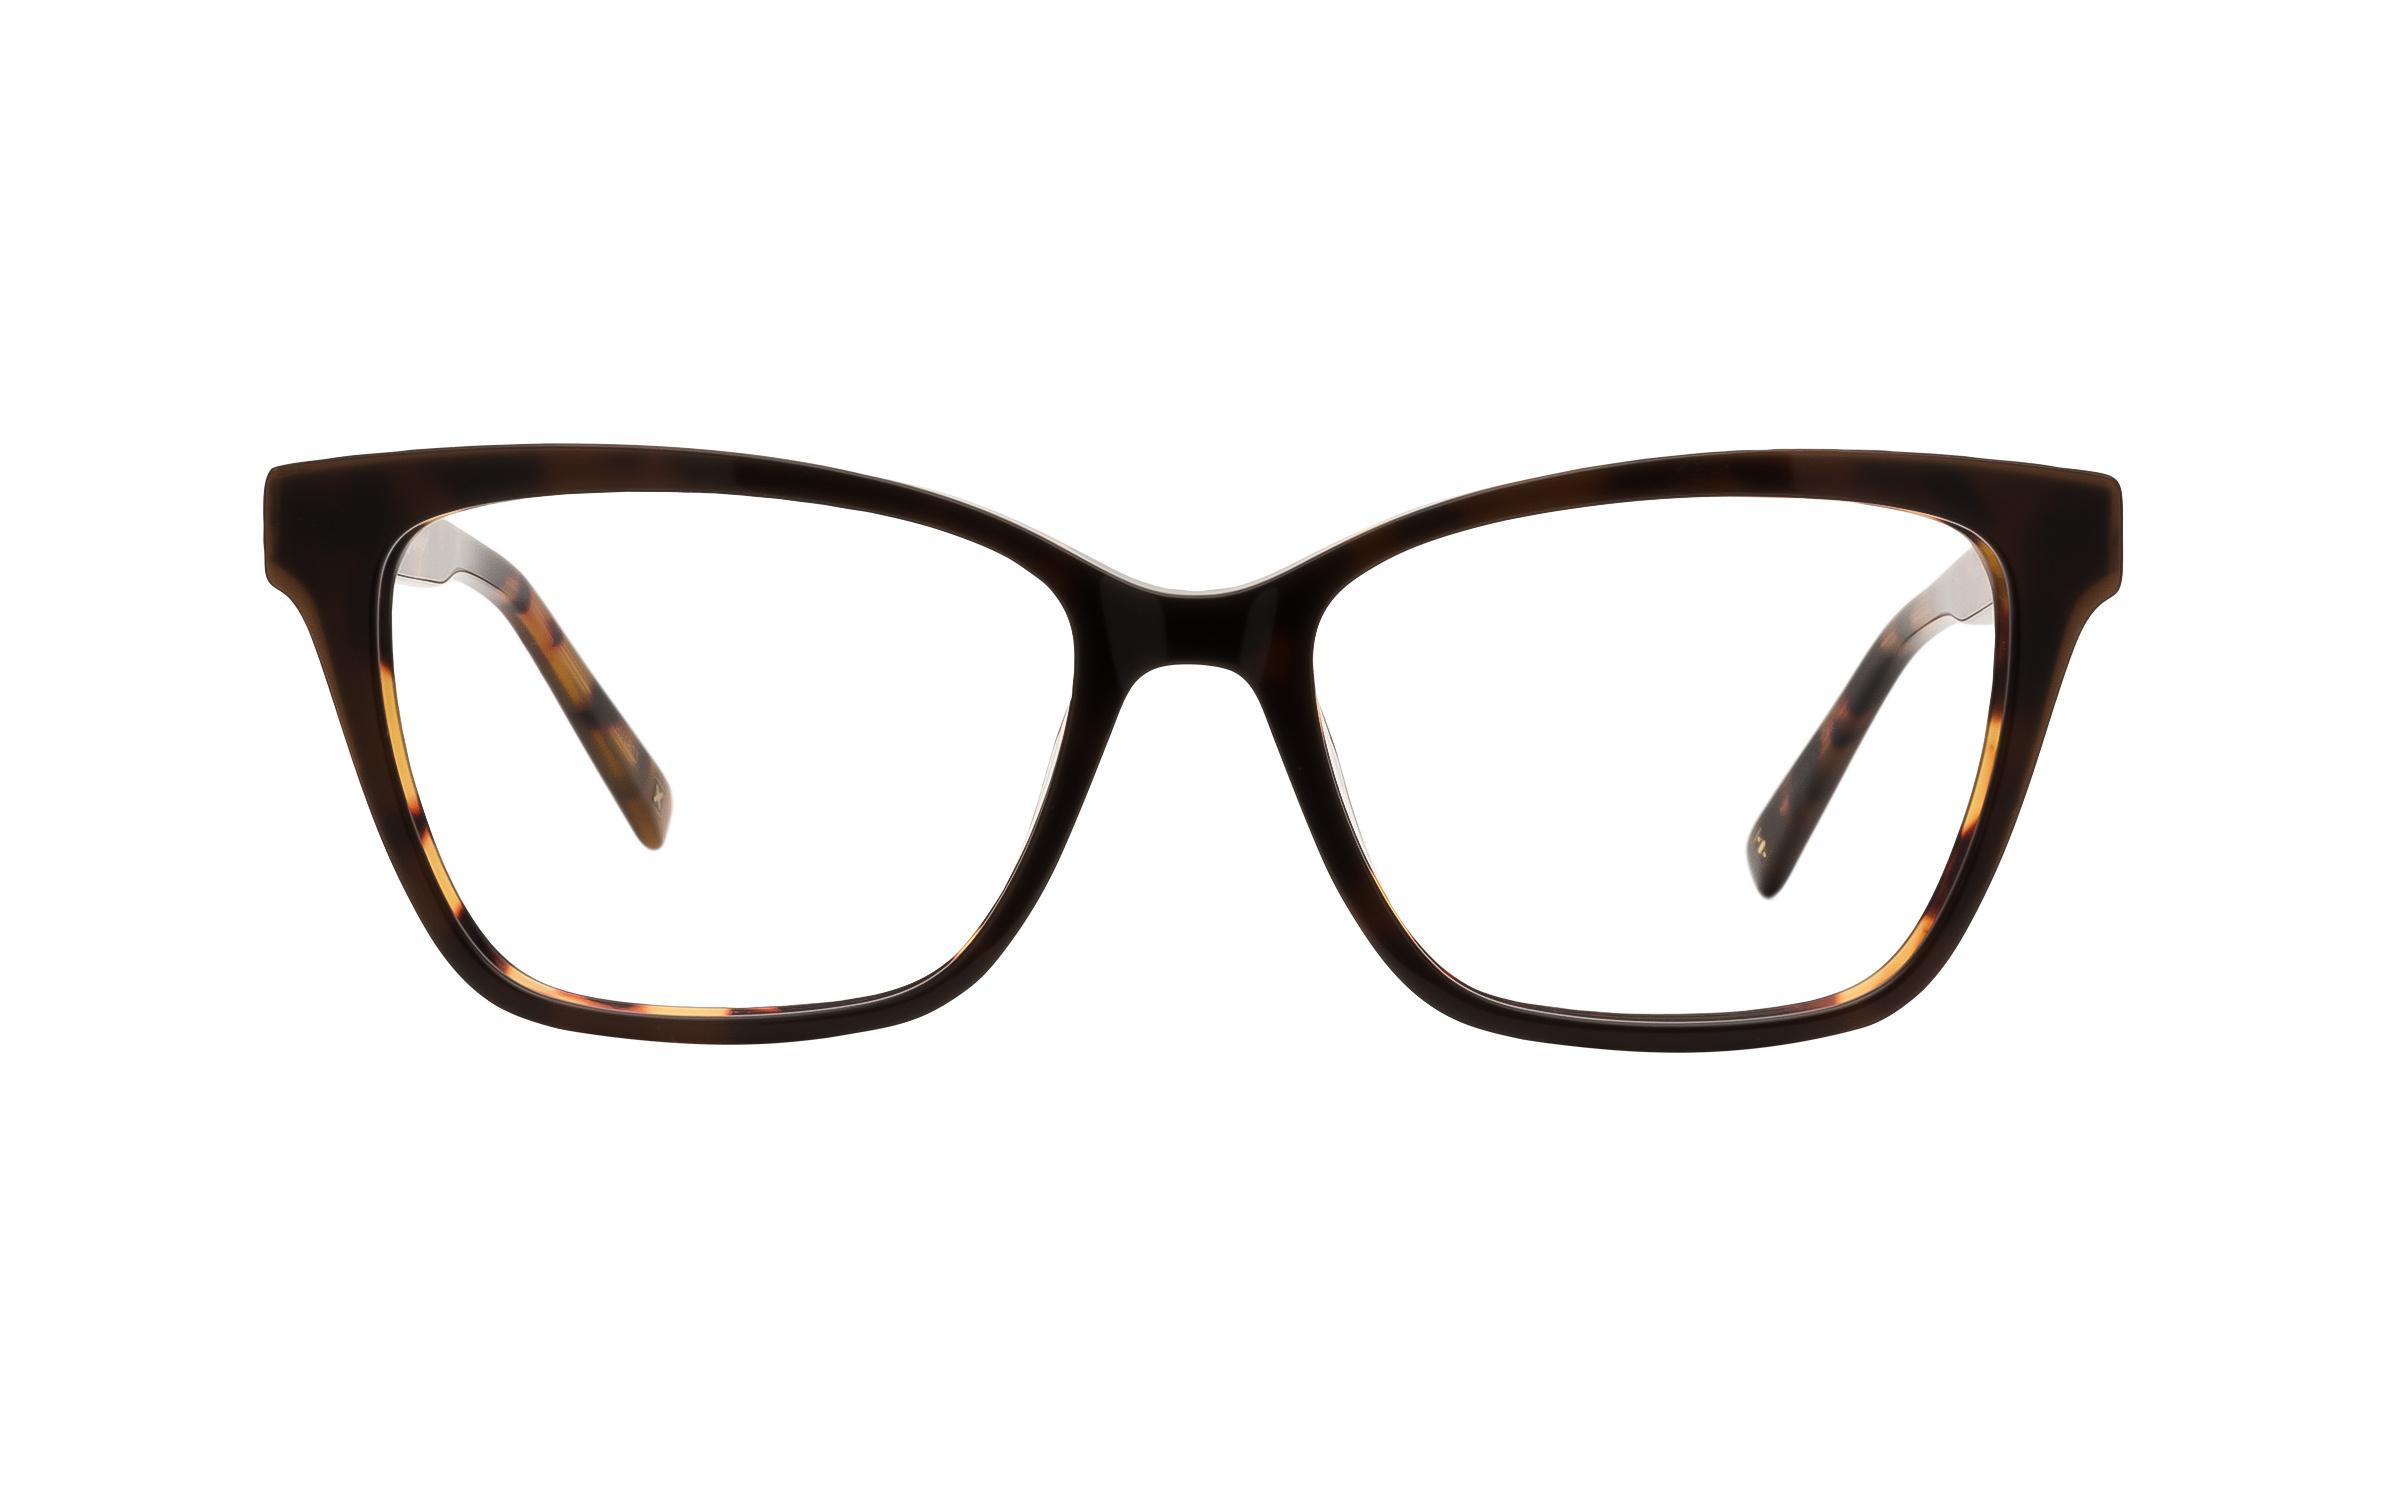 Derek_Cardigan_Womens_Glasses_DFrame_BrownTortoise_Acetate_Online_Coastal